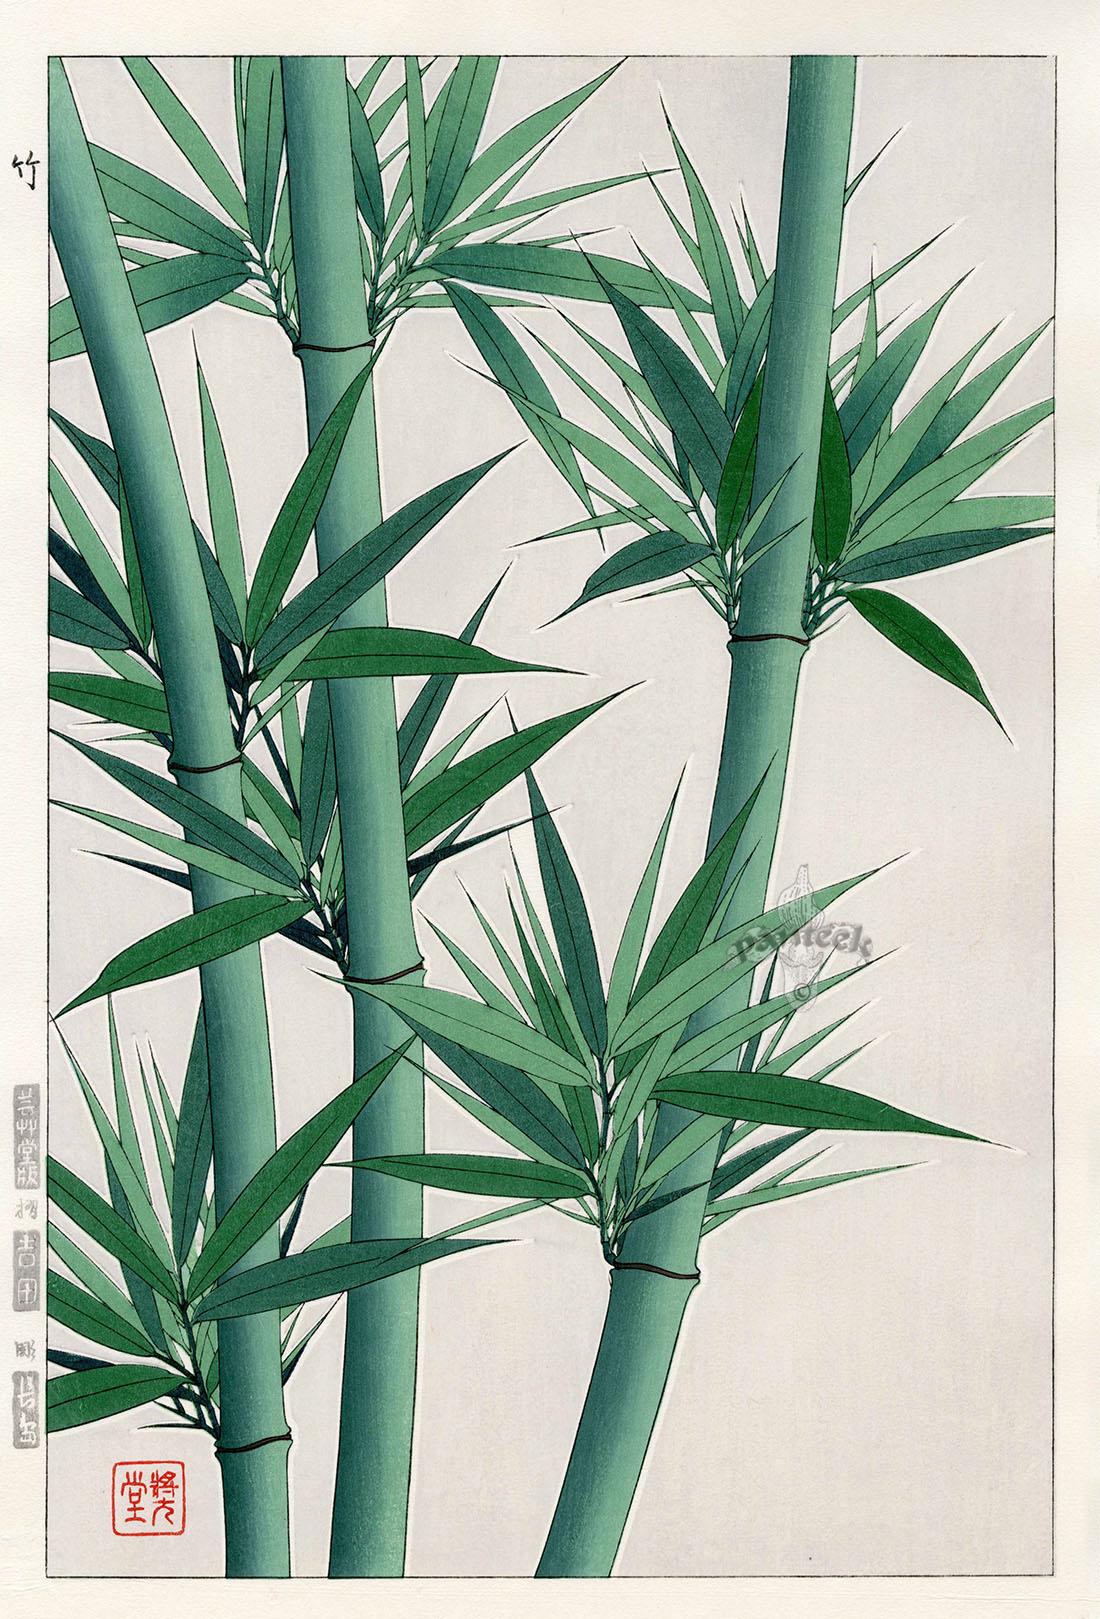 #4019 Bamboo